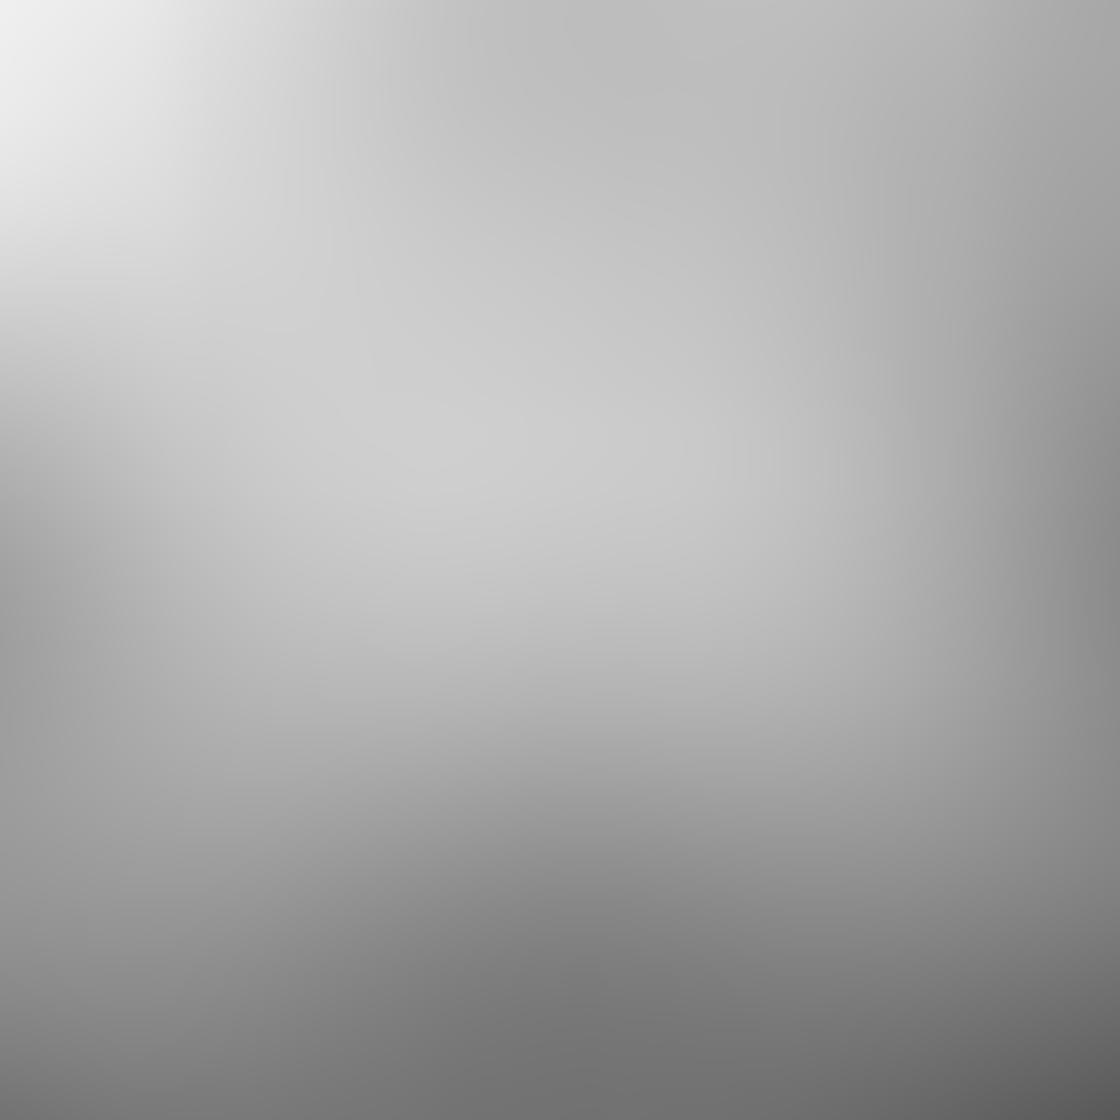 iPhone Photo Perspective 28